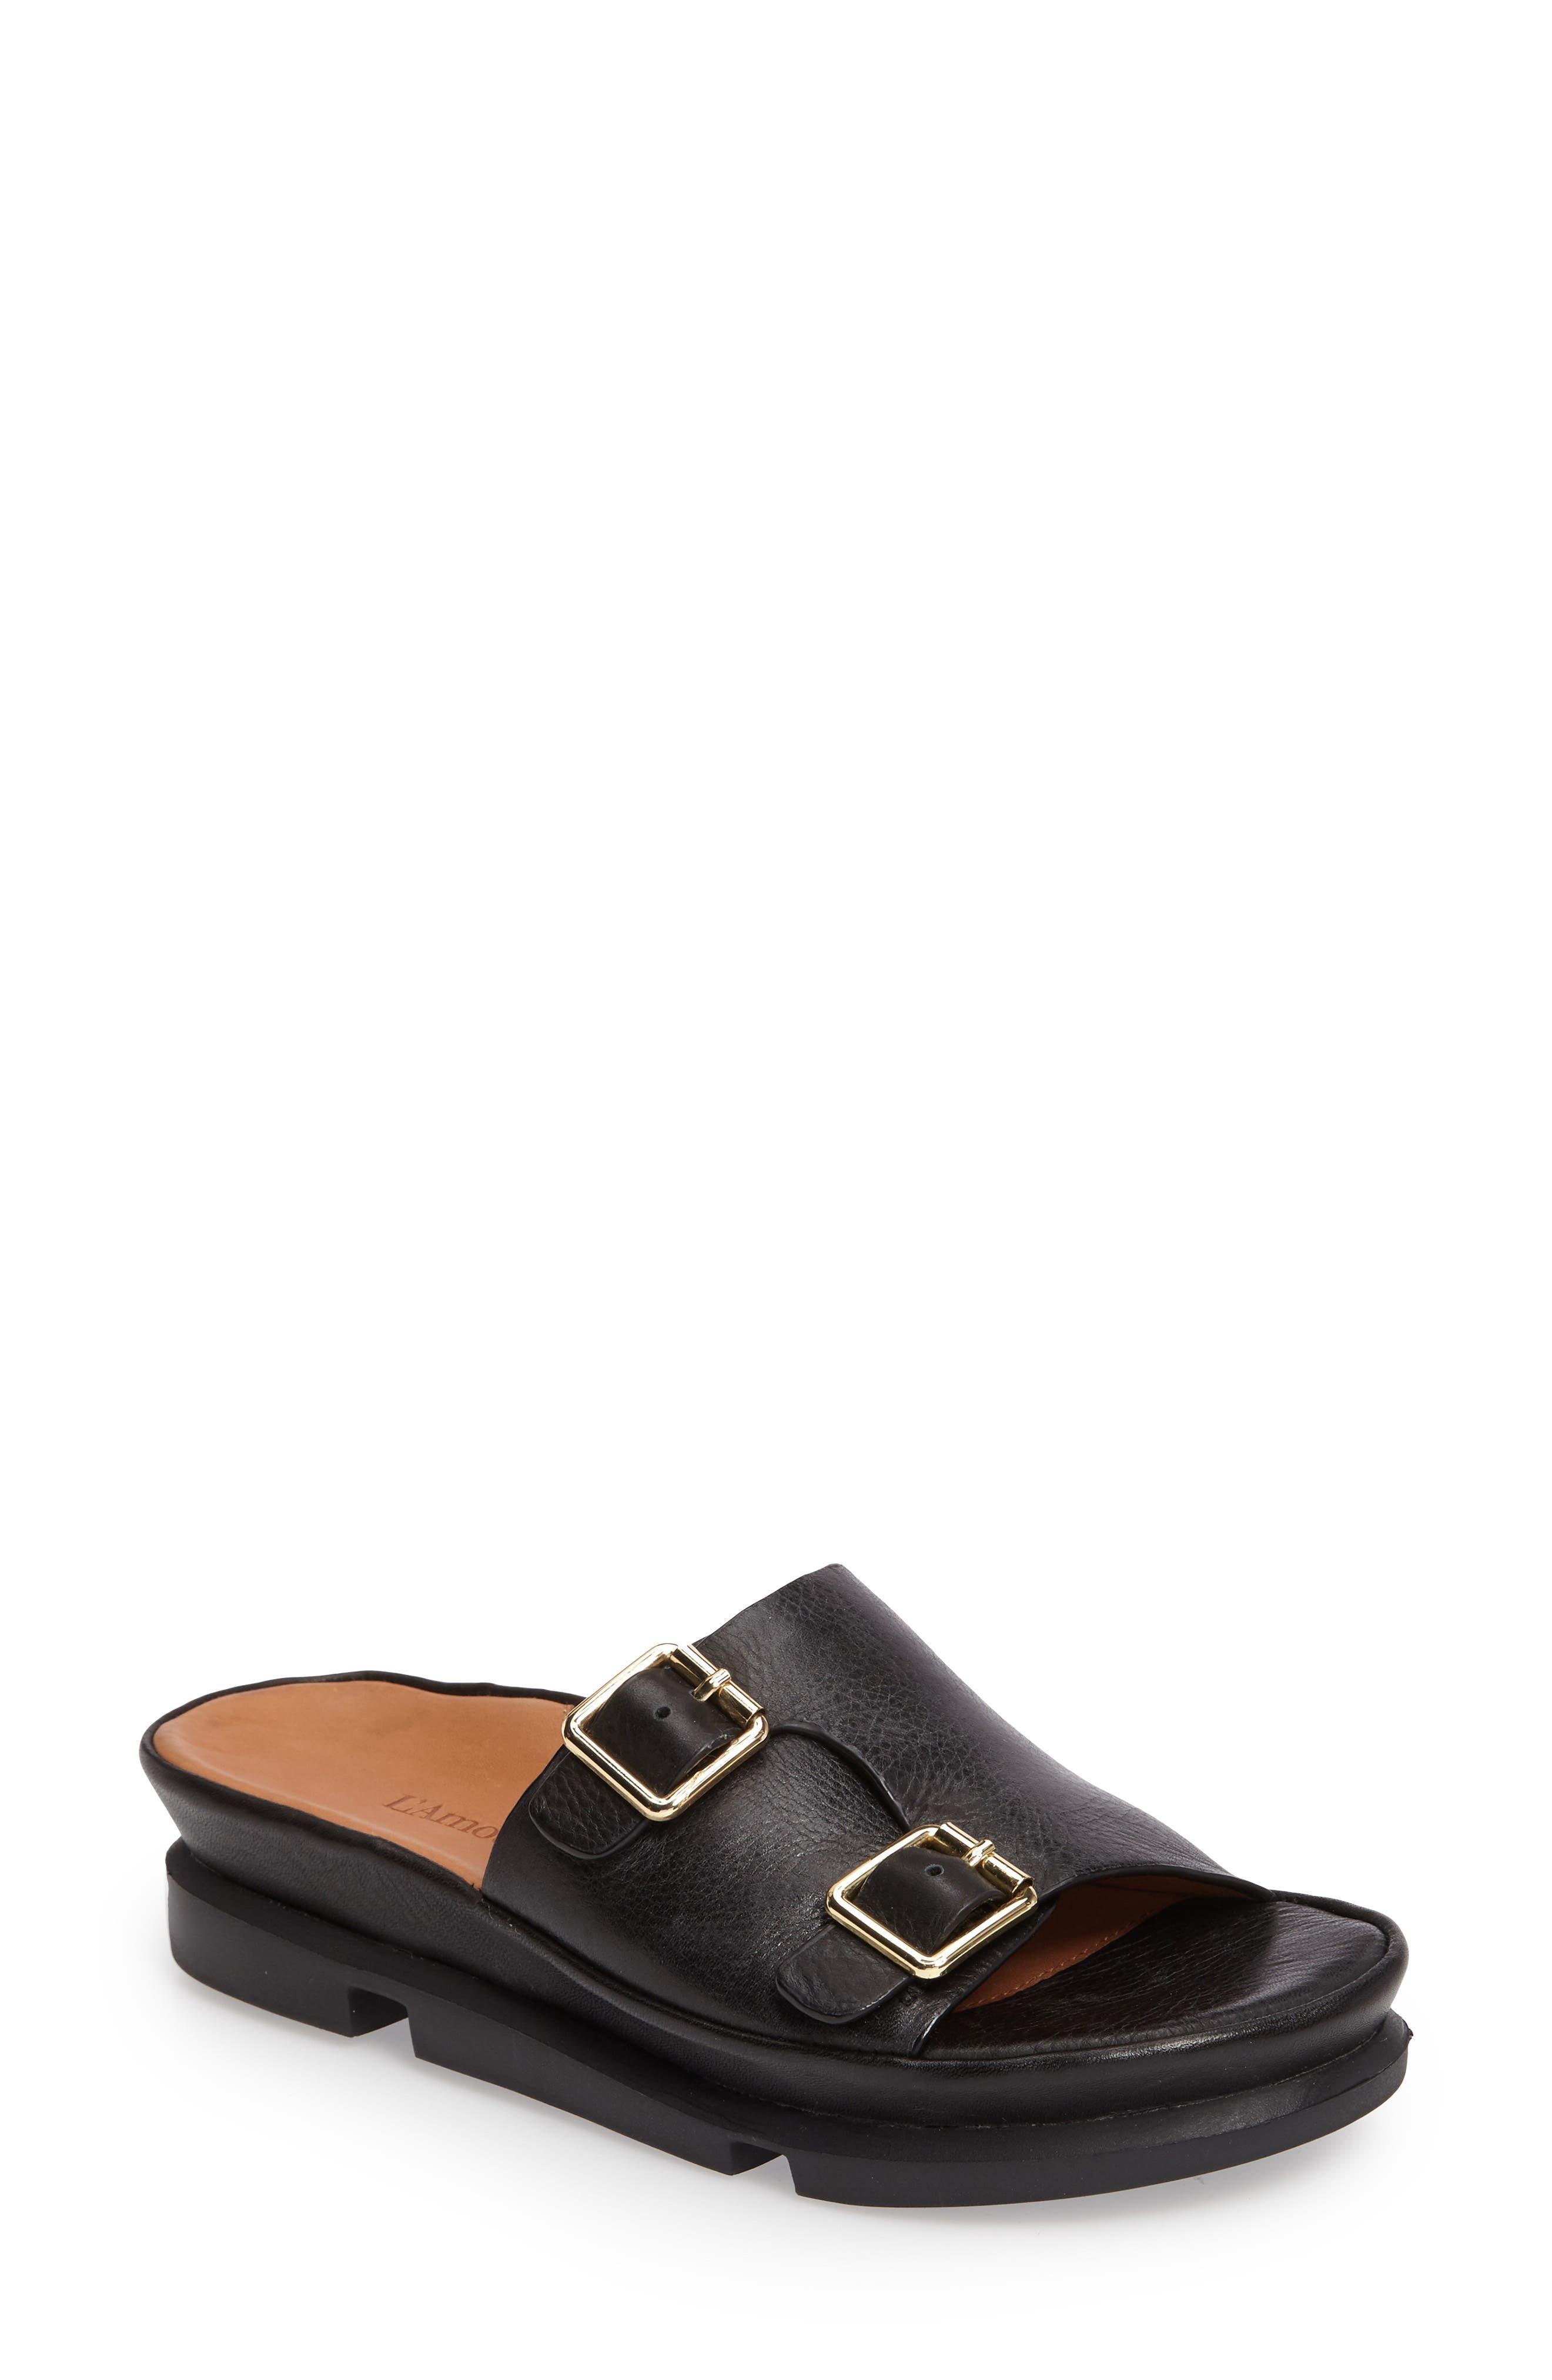 Viareggio Slide Sandal,                         Main,                         color, BLACK LEATHER